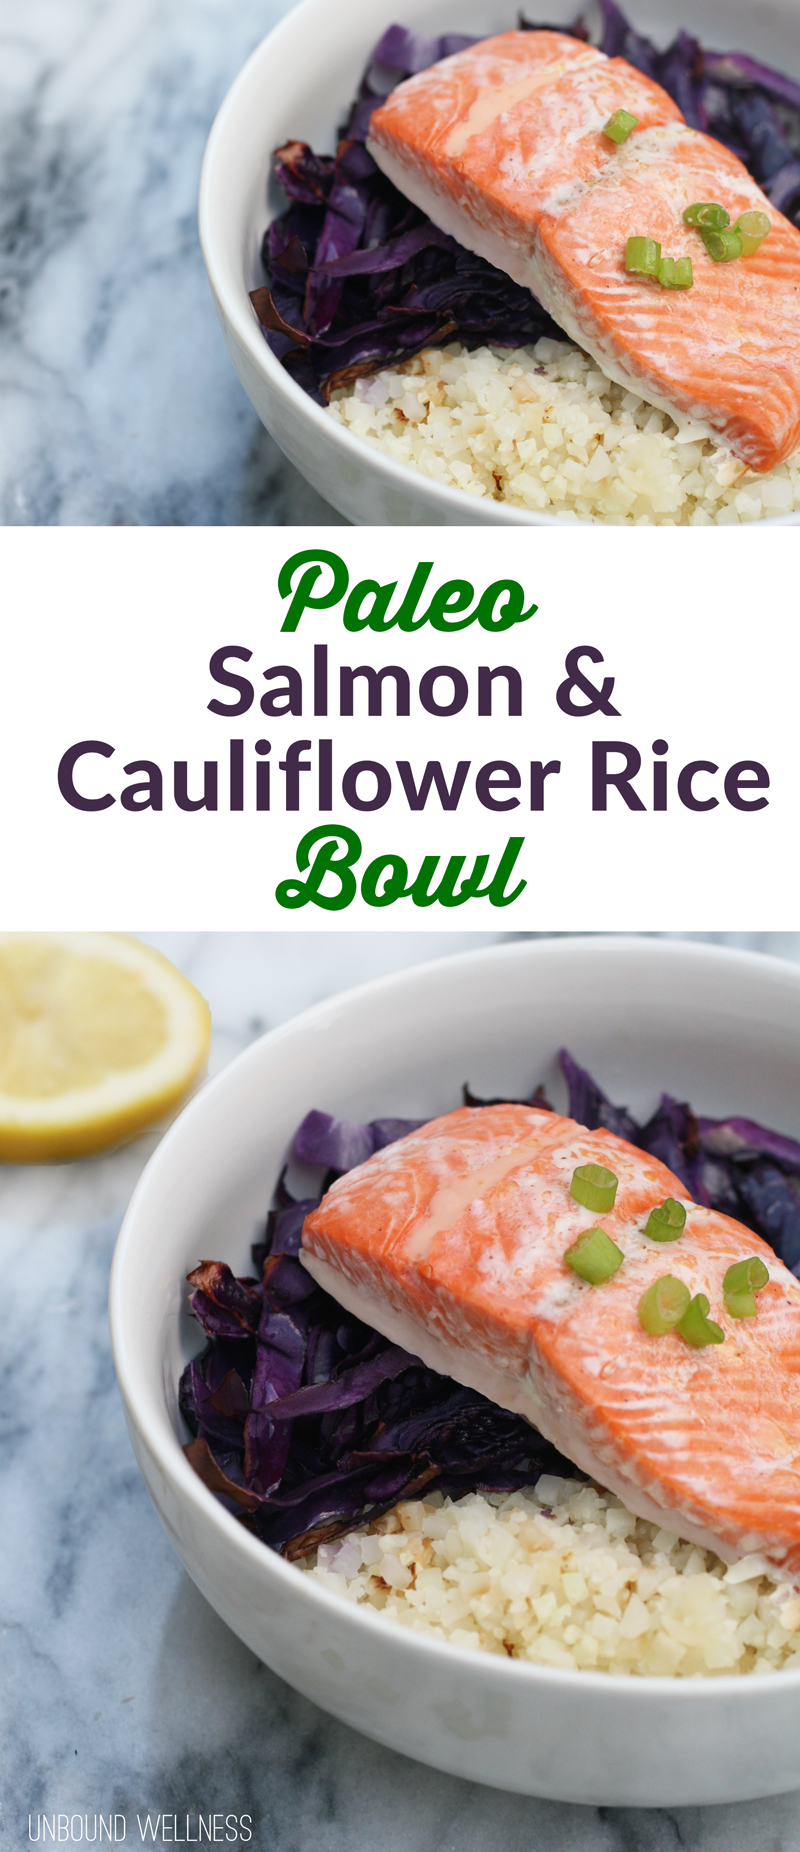 Paleo Salmon & Cauliflower rice bowl